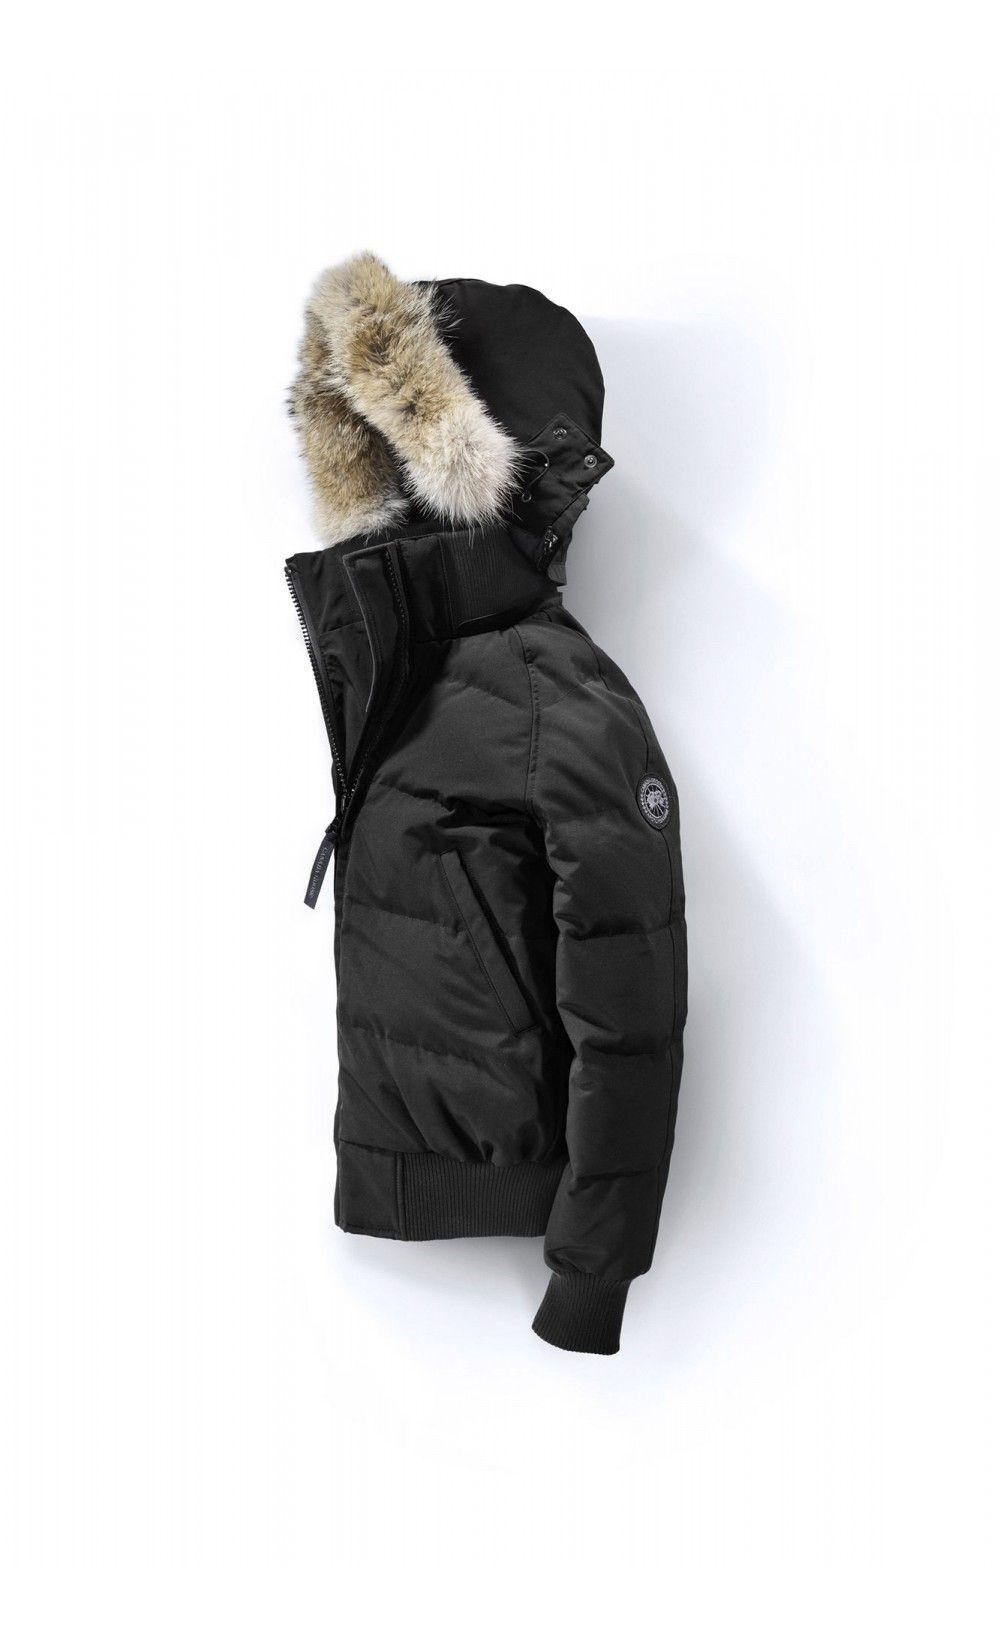 c3c15bb6f7ef Canada Goose Savona Bomber Black Women - Canada Goose  canadagoose  parka   jacket  fashion